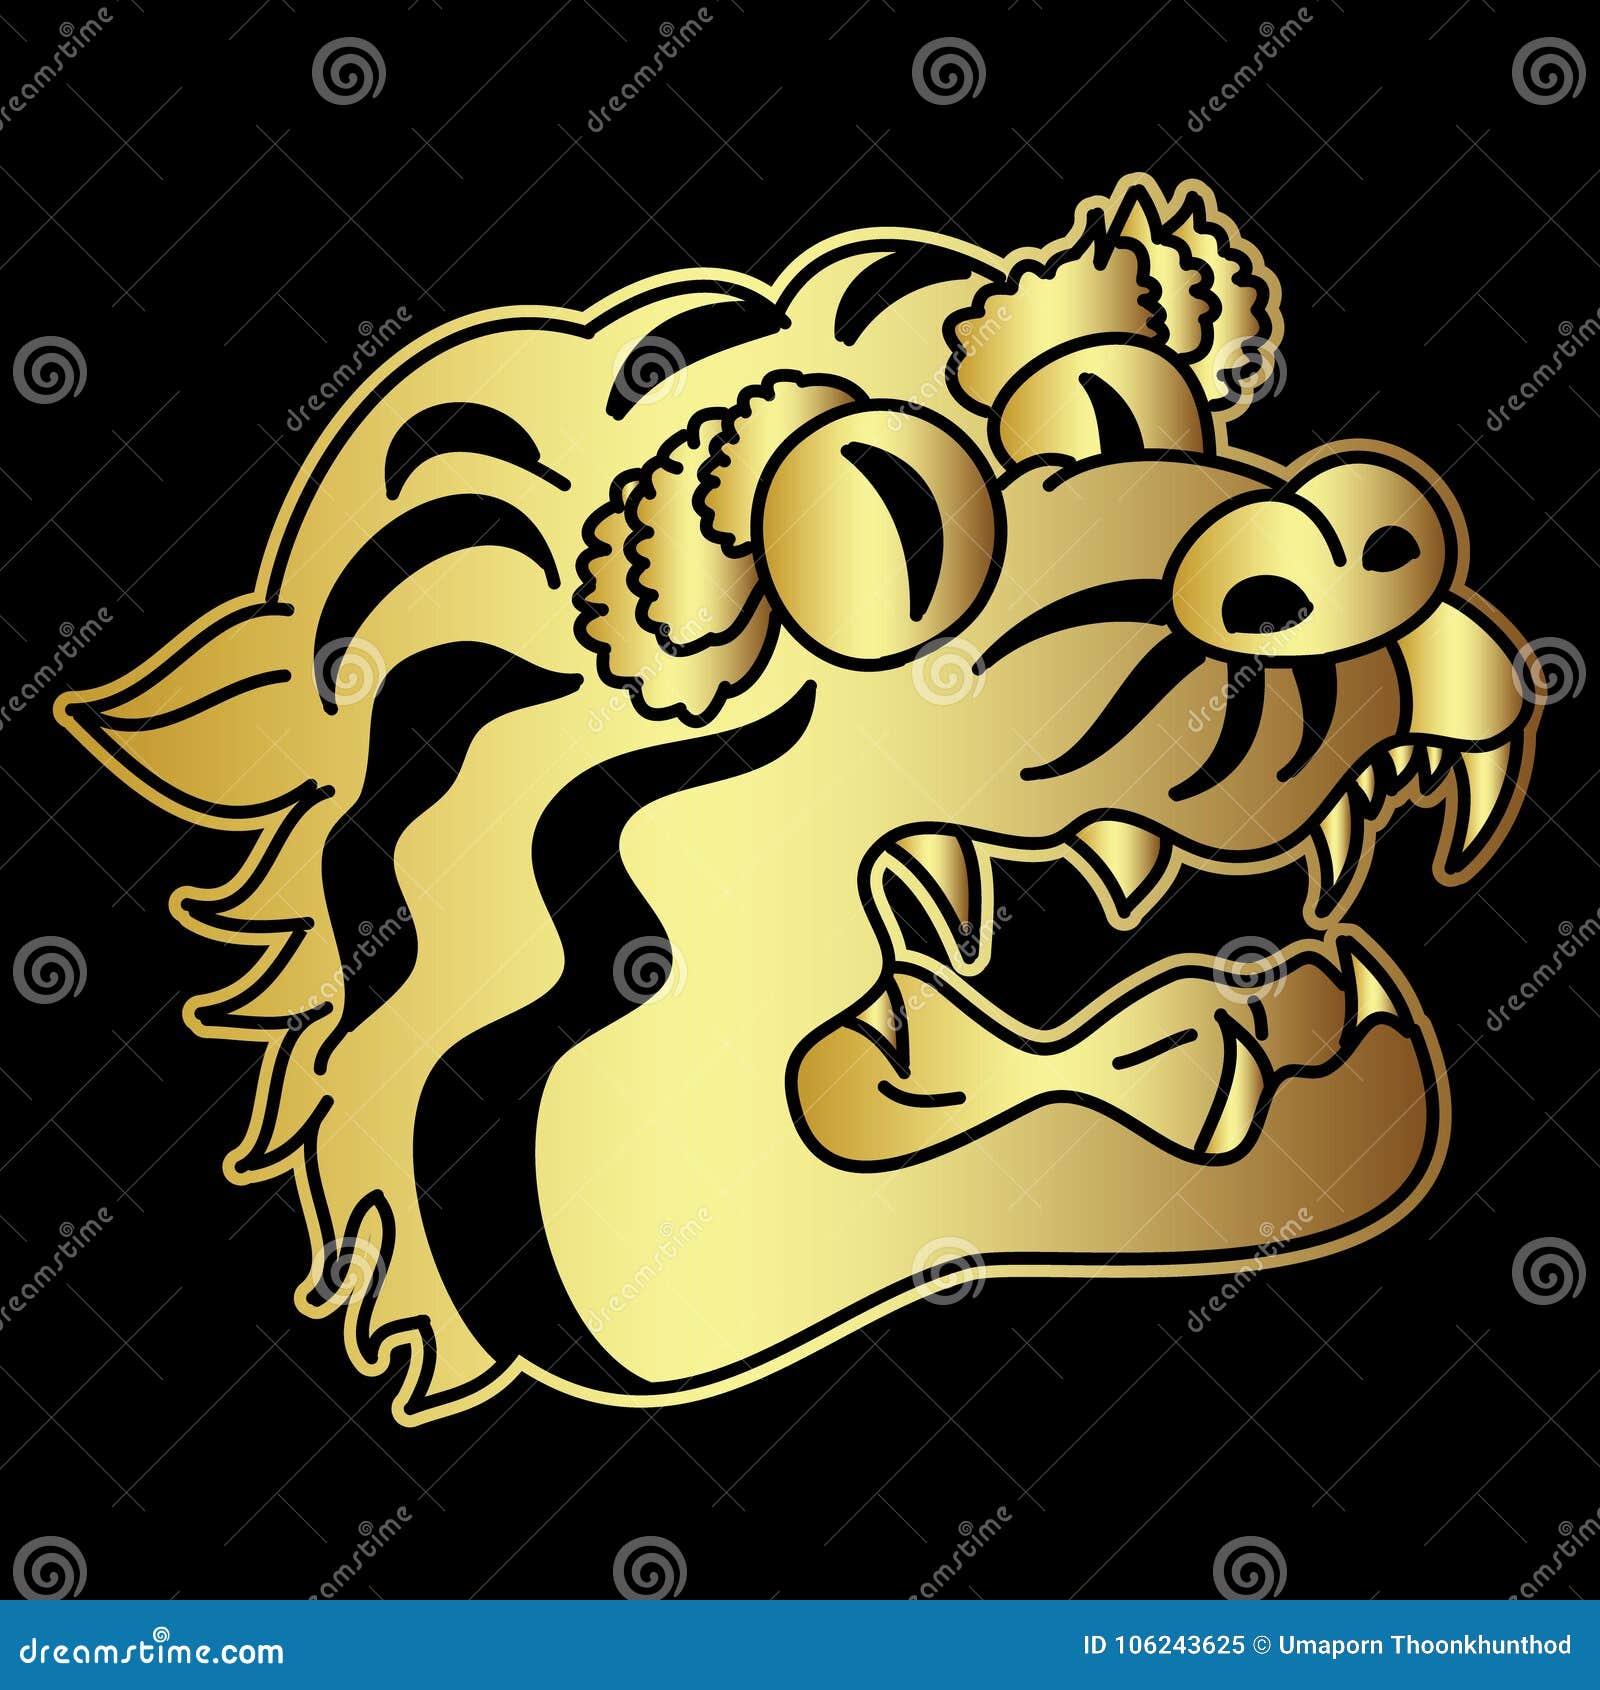 Golden Japanese Tiger Head Tattoo Design Vector For Sticker Stock Vector Illustration Of Coloring Decoration 106243625